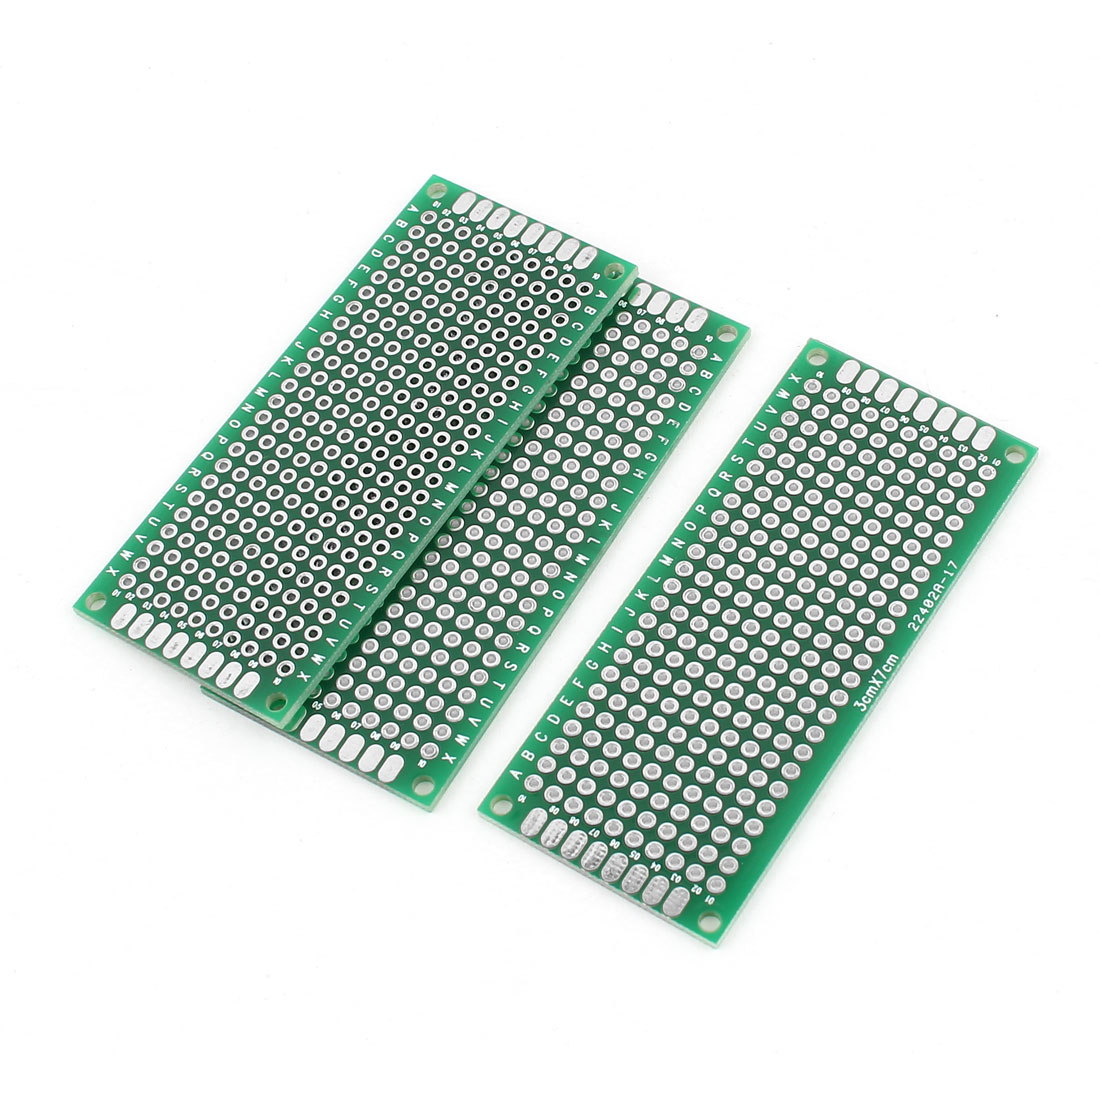 3 Pcs Universal Dual Side DIY Prototype PCB Board 3cmx7cm